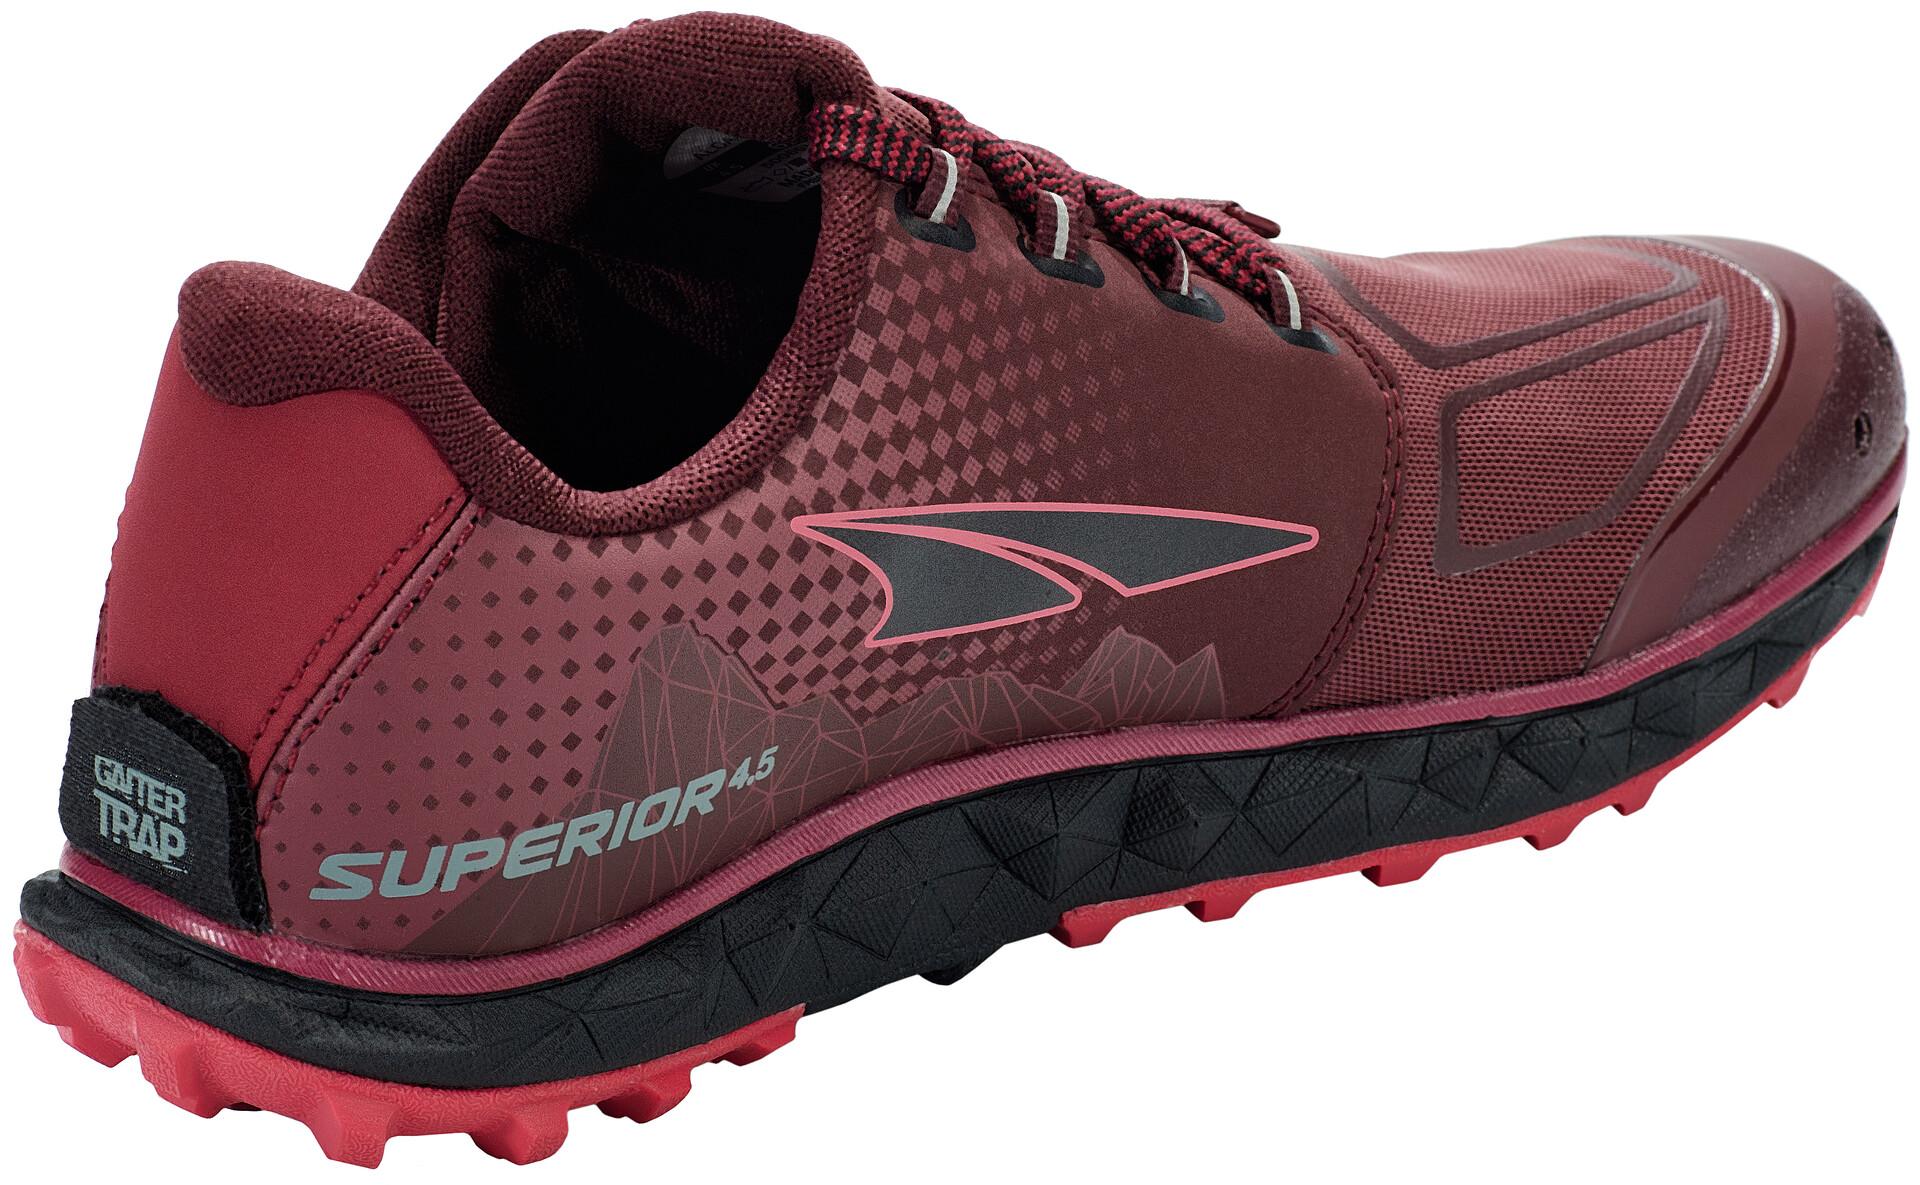 Altra Superior 4 Running Shoes Dame plum | Gode tilbud hos